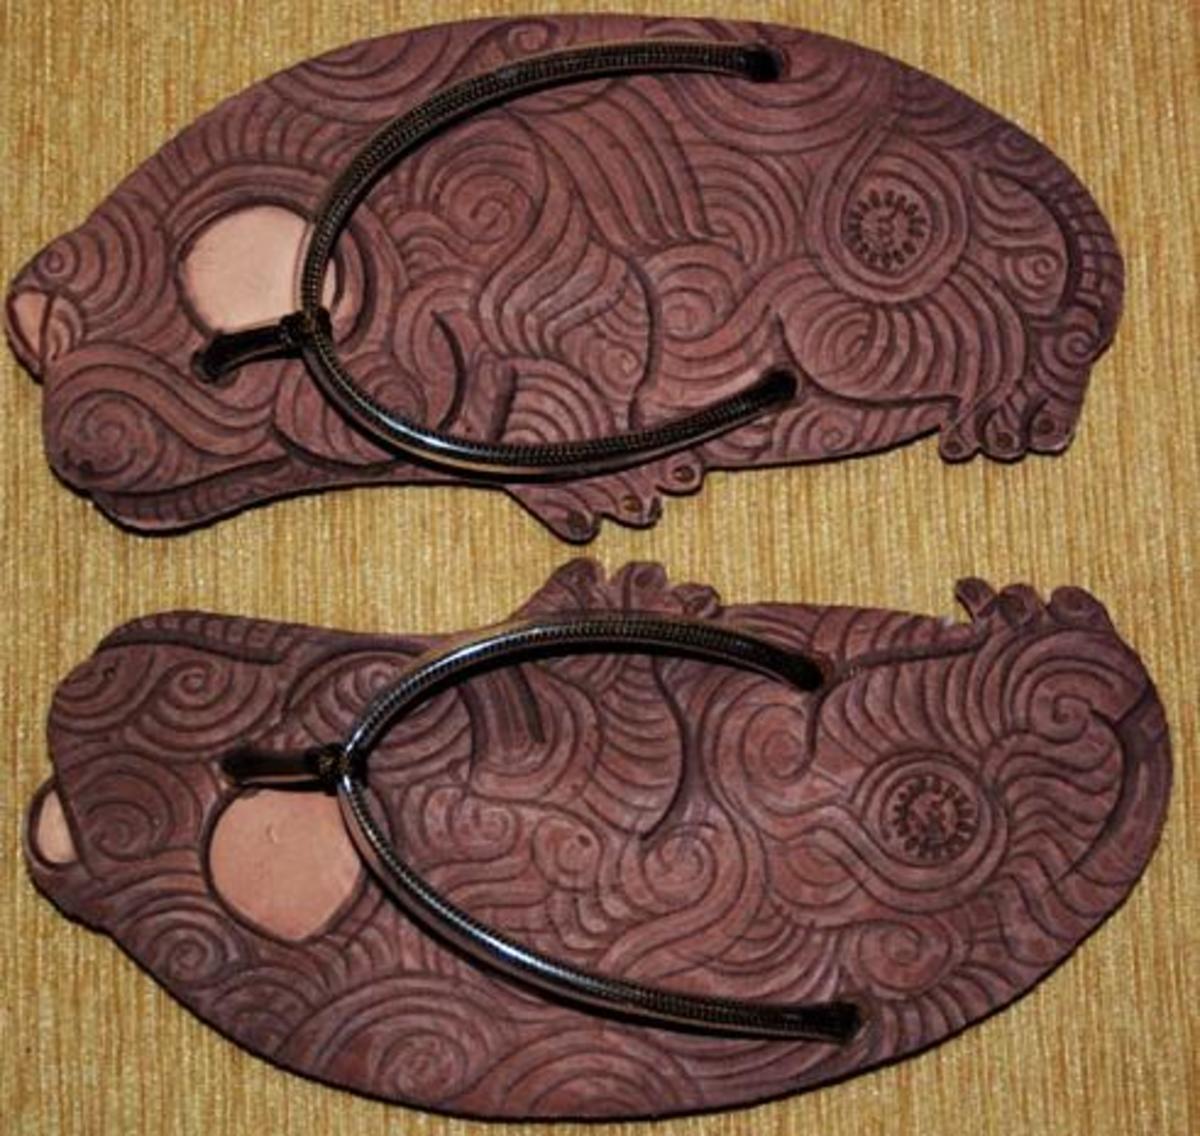 Sponge Sandal with Batik motif from Indonesia